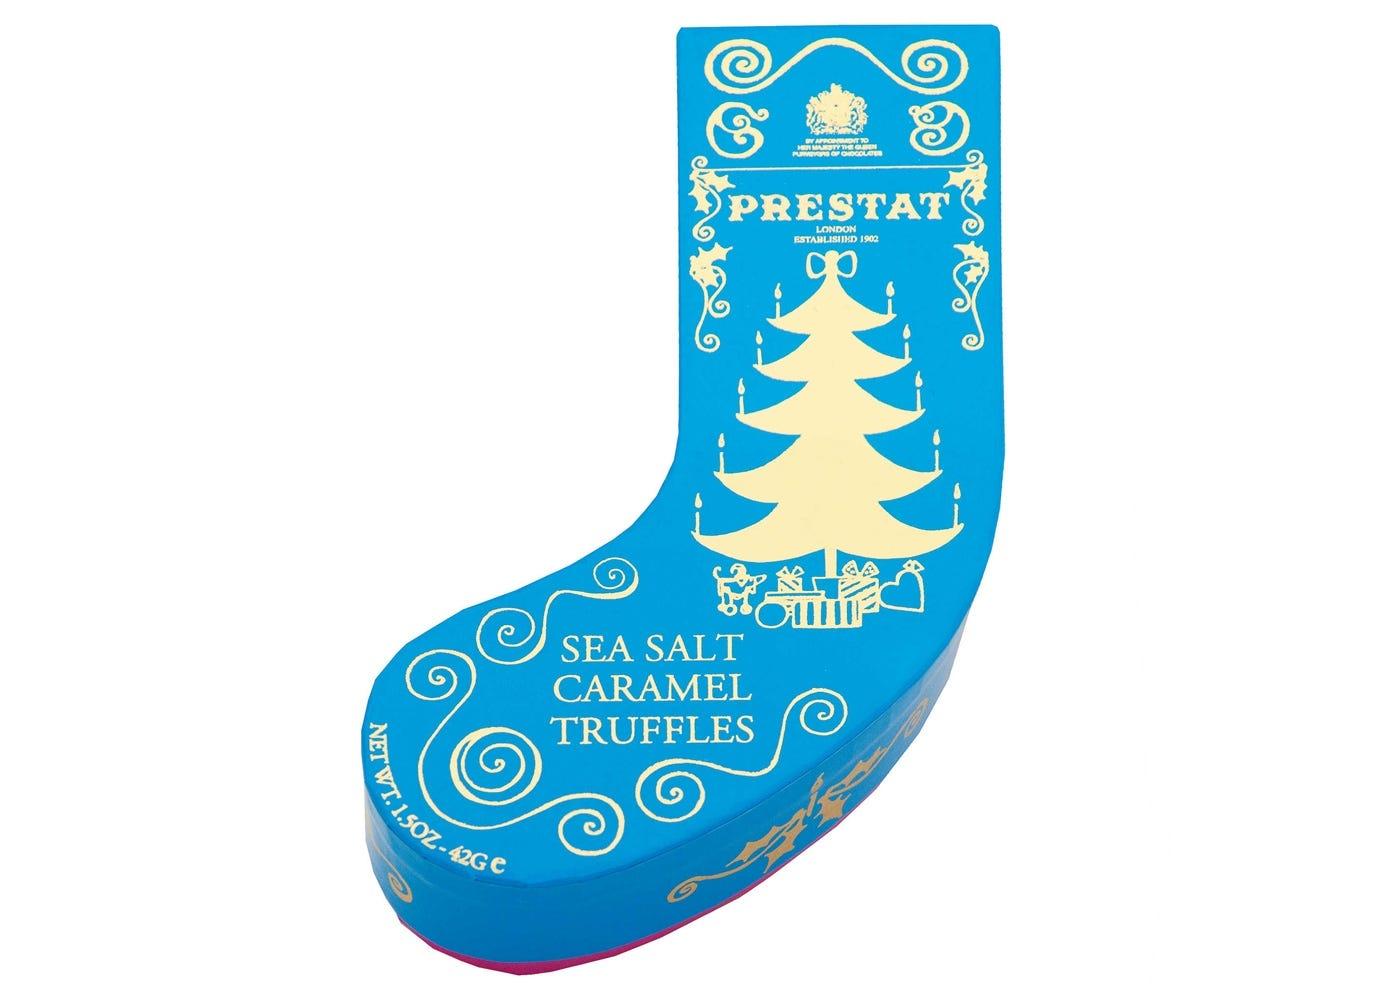 Prestat Stocking Box Caramel Sea Salt